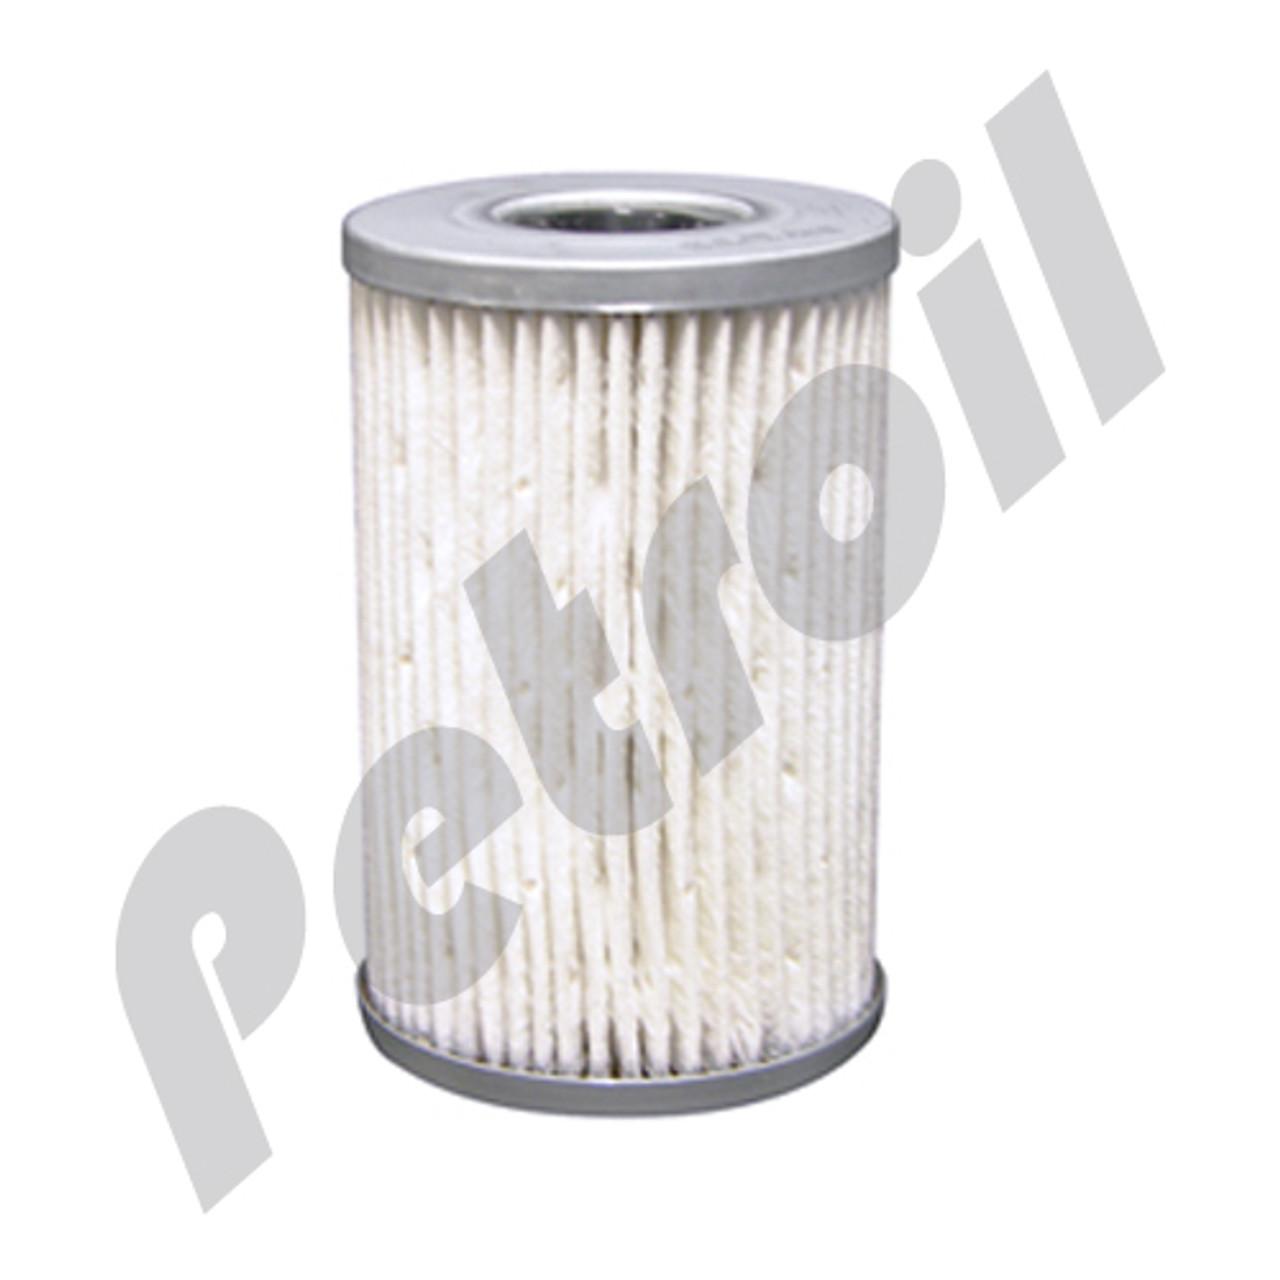 (case of 12) pf7779 baldwin hd fuel element (diesel)  next  pf7779 baldwin fuel  filter cartridge type international truck